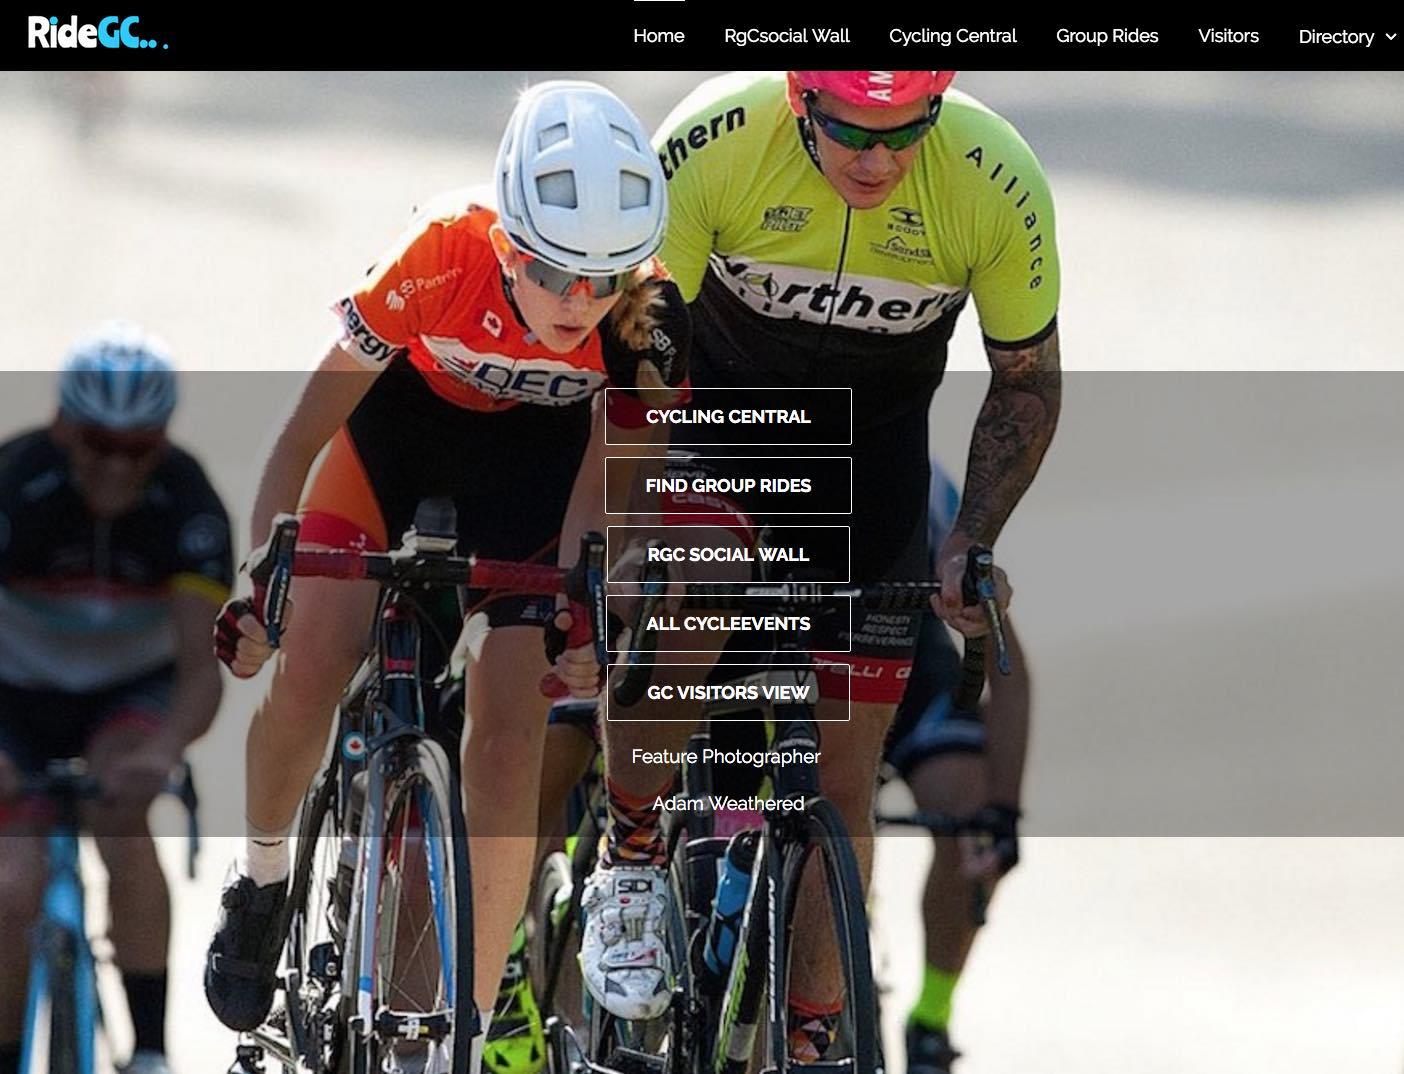 RideGC Front Page